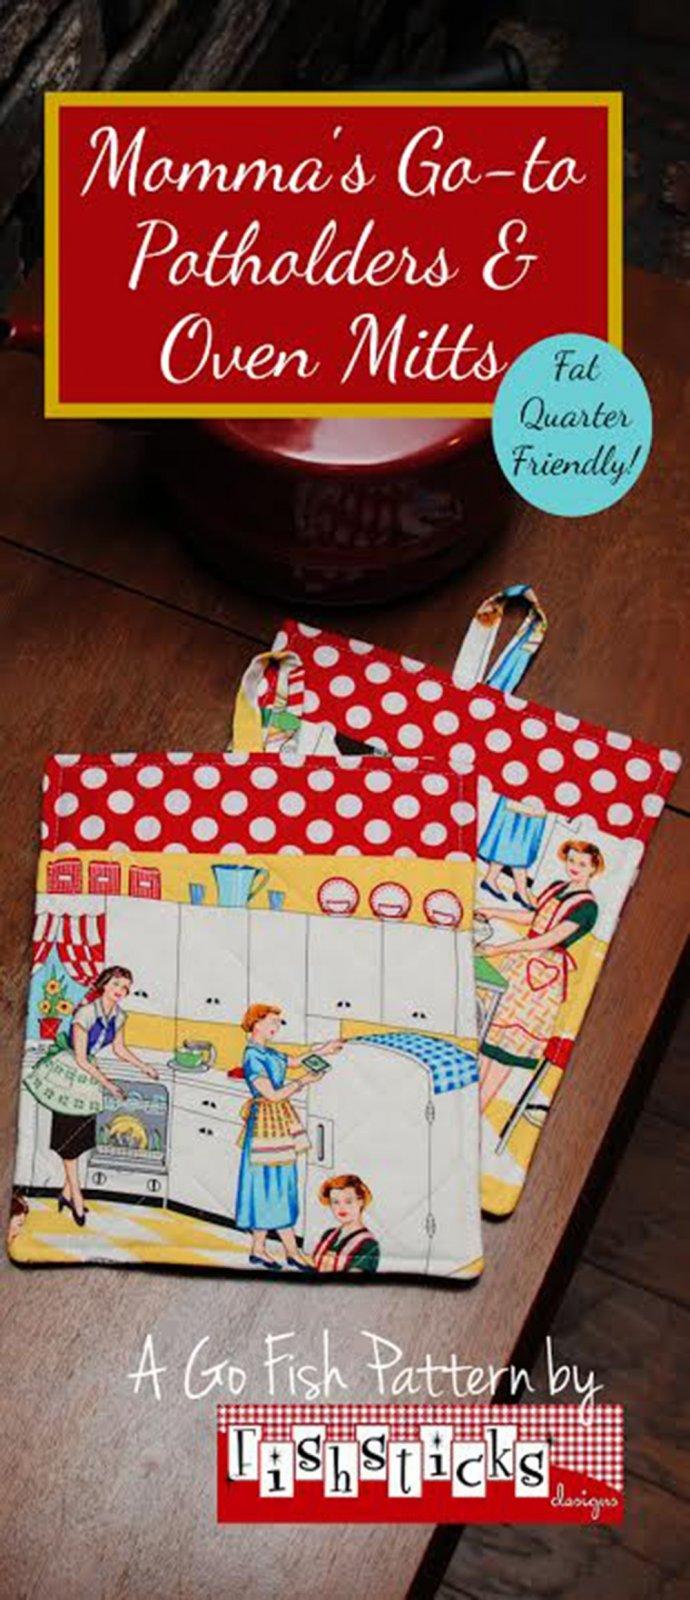 Momma's Go-To Potholders & Oven Mitts